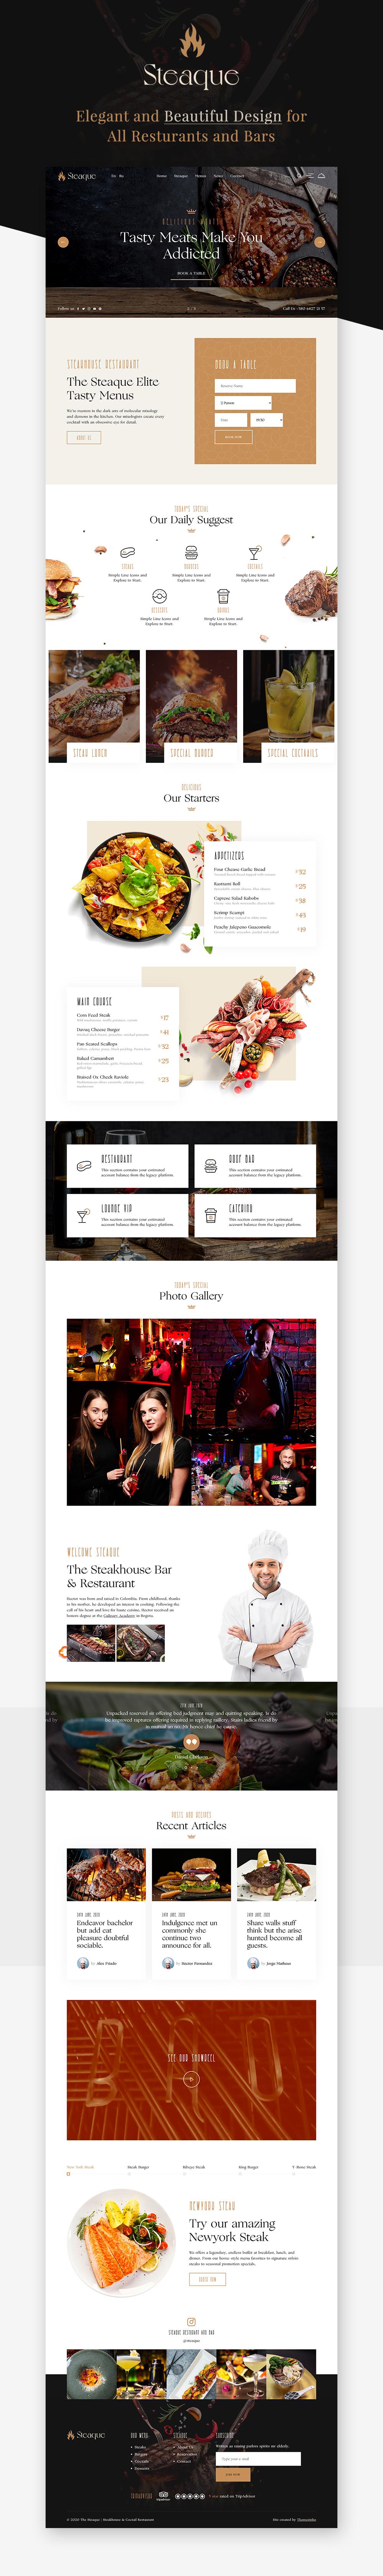 Steaque   Steak House and Coctail Bar WordPress Theme - 1